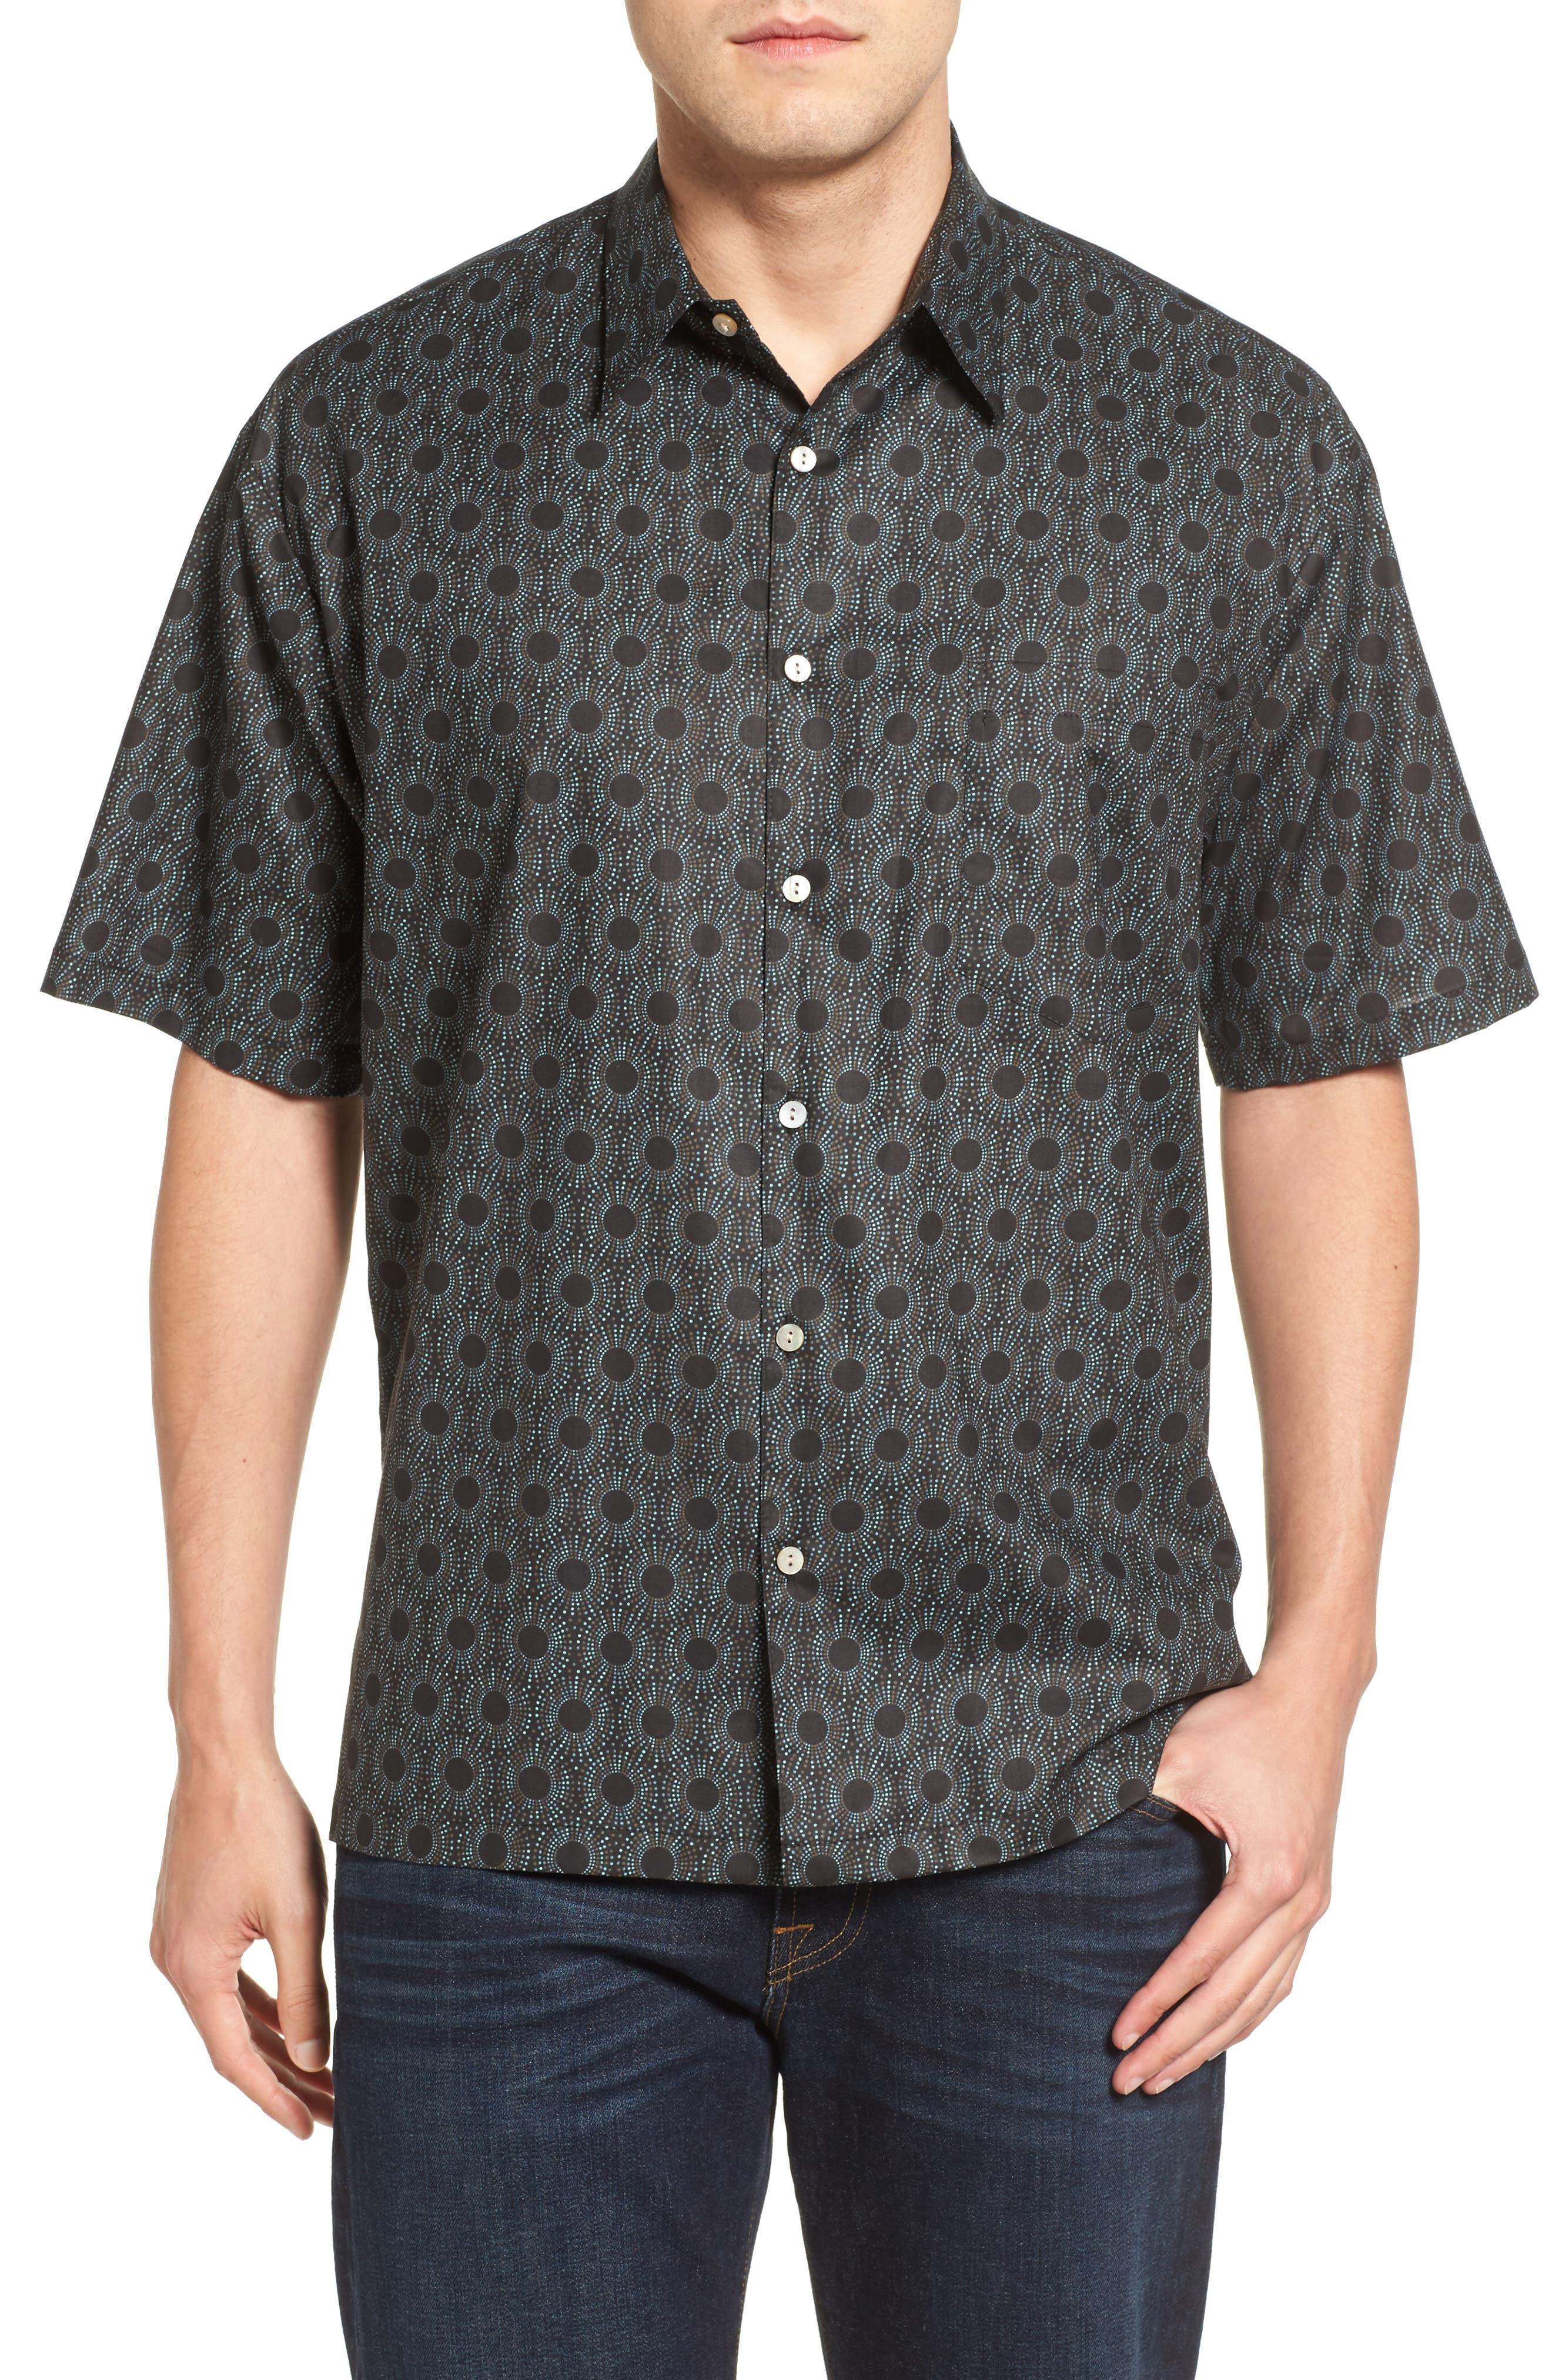 Tori Richard Hypnotique Short Sleeve Classic Fit Sport Shirt